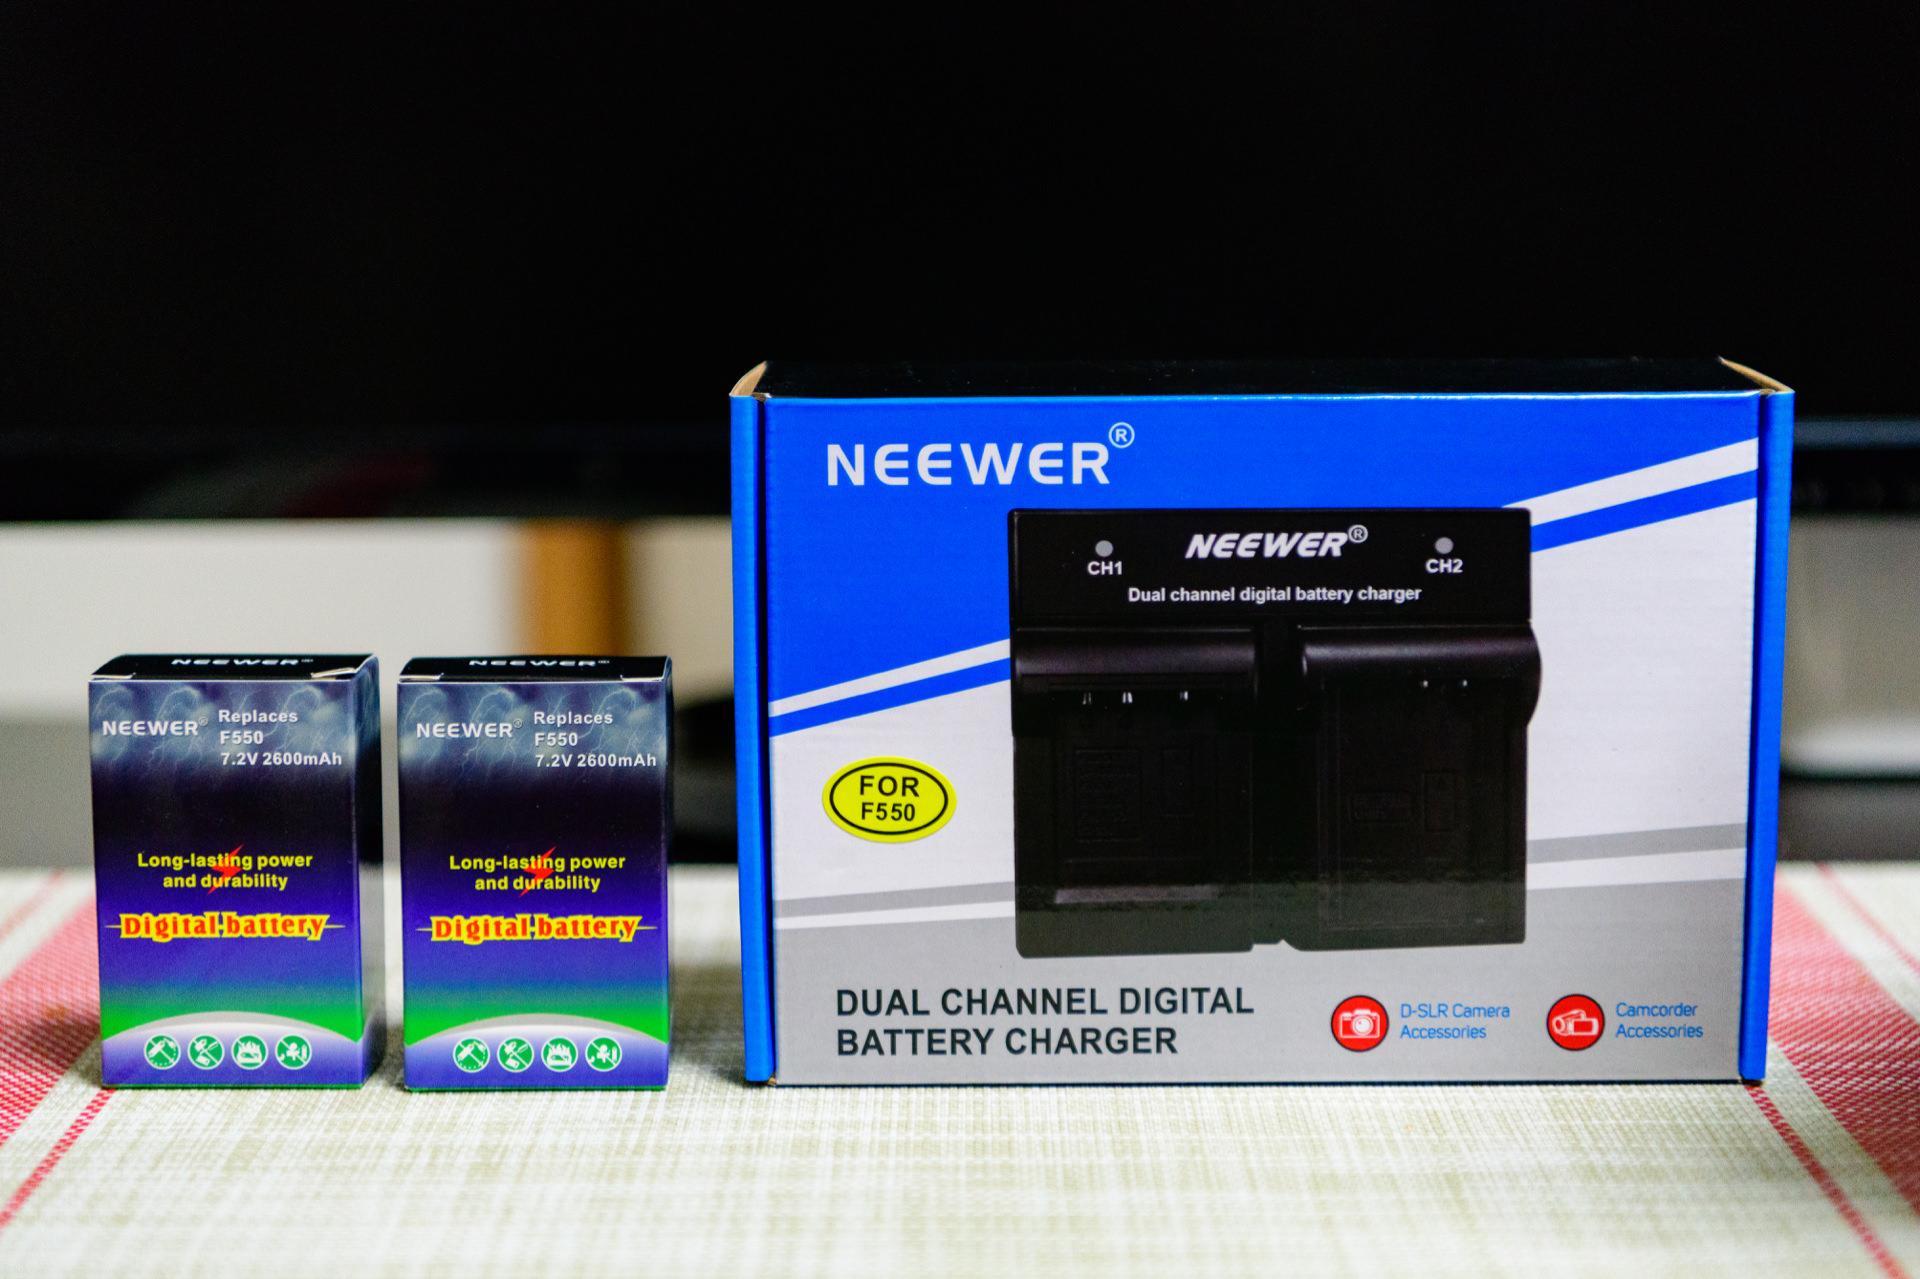 Neewer カメラバッテリ 充電器セット